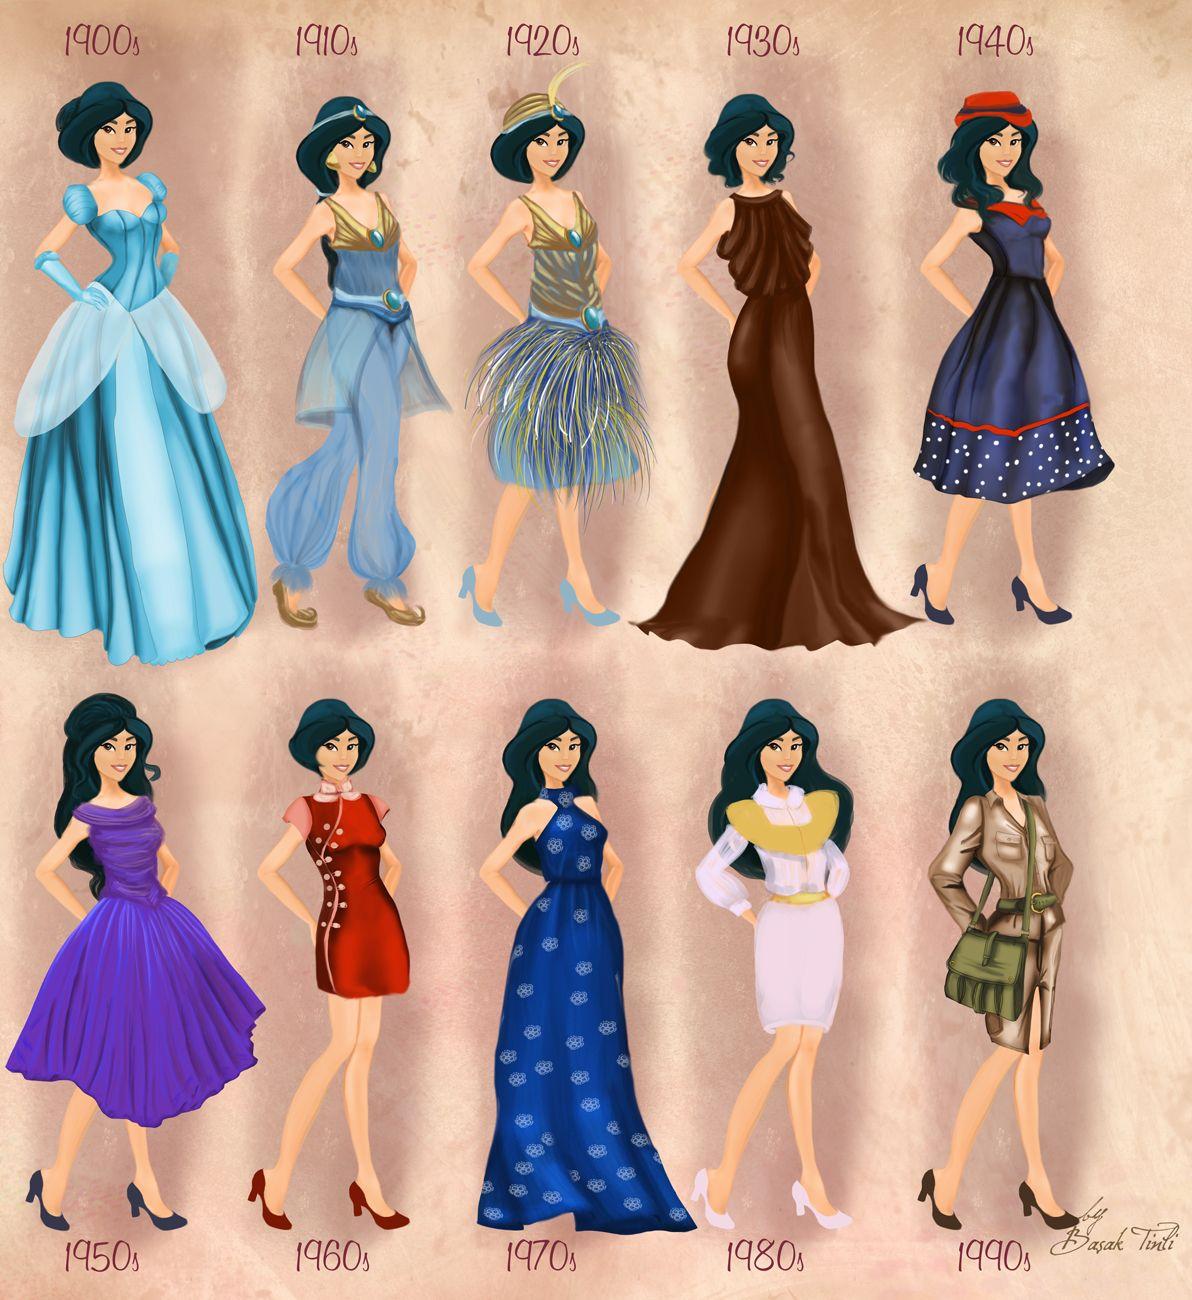 Jasmine in 20th century fashion by BasakTinli by BasakTinli.deviantart.com on @DeviantArt